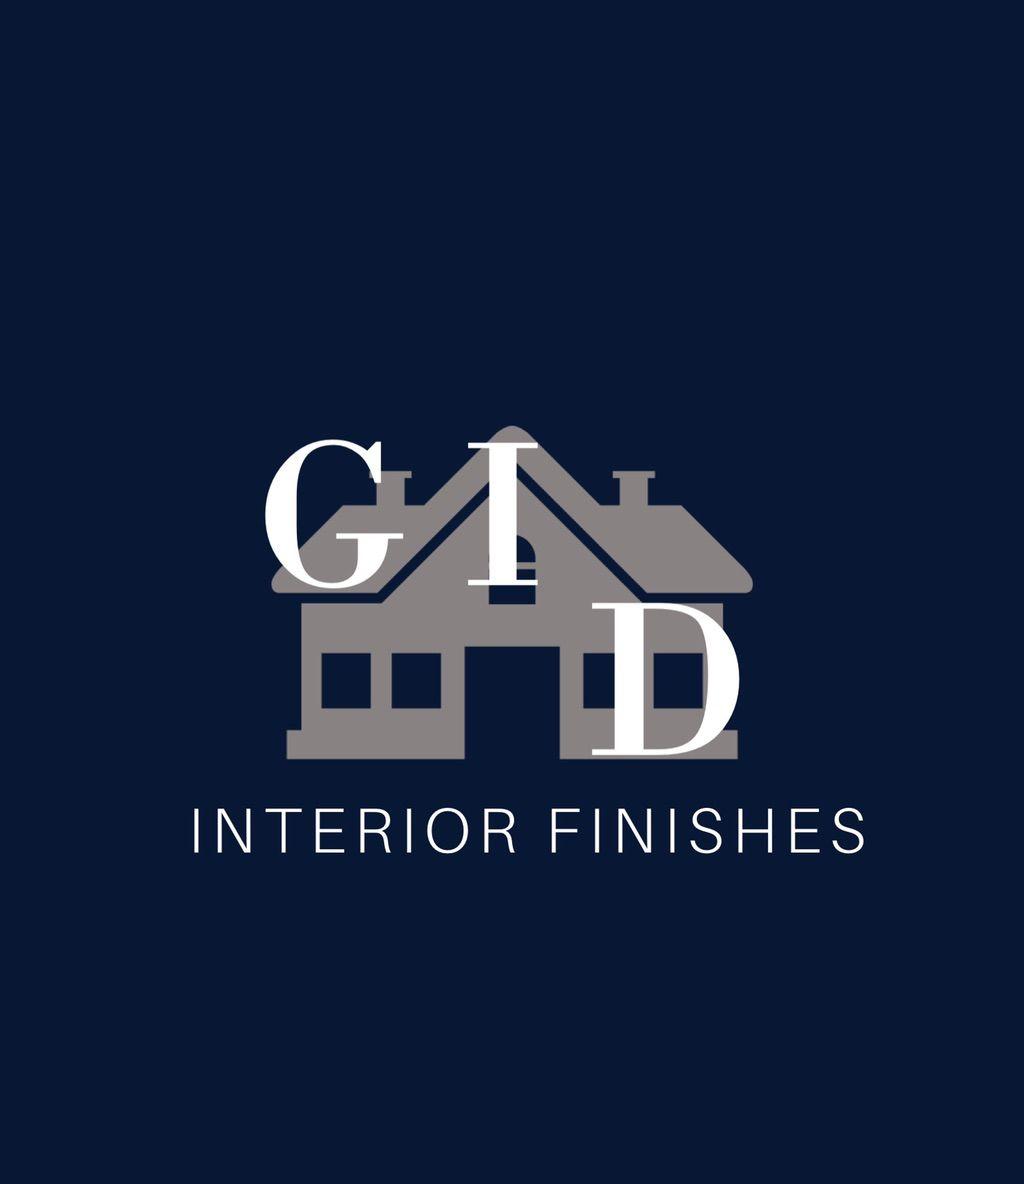 G.I.D. Interior Finishes